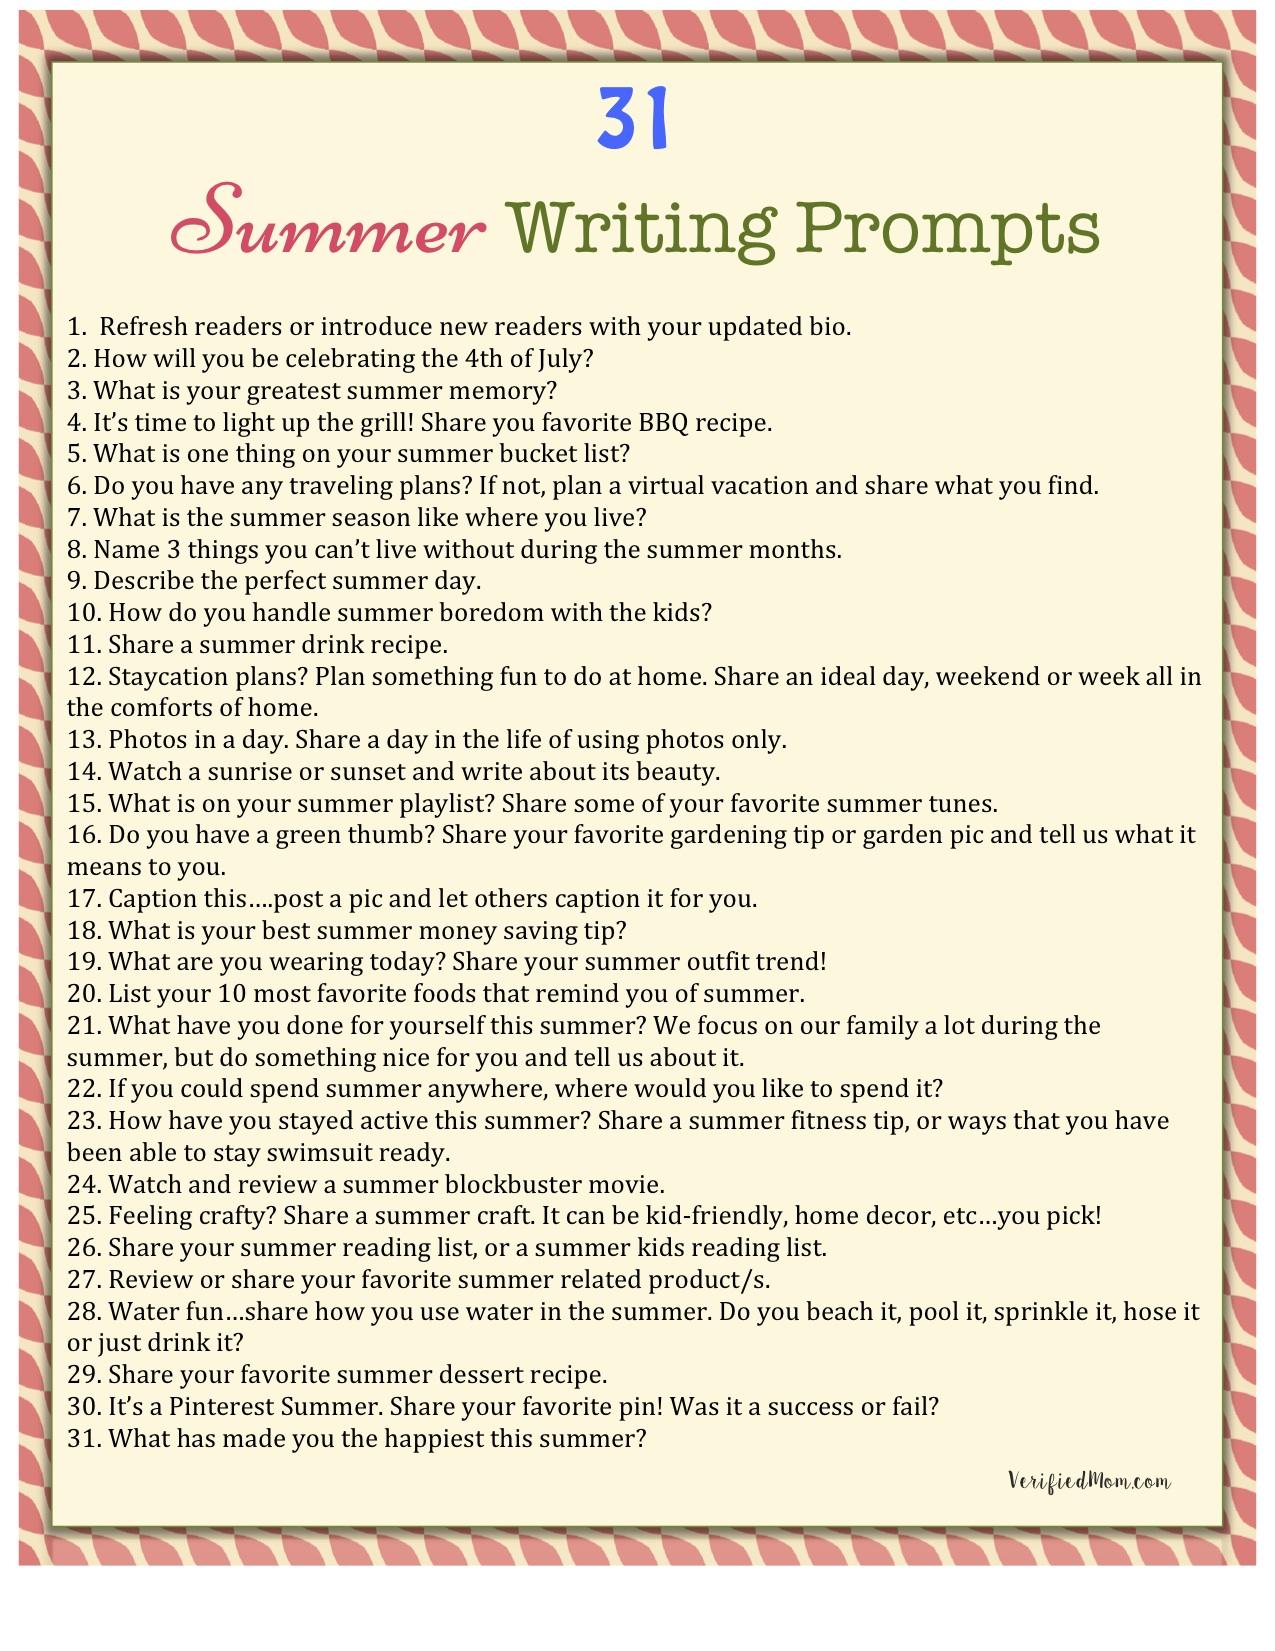 Verified essay writers